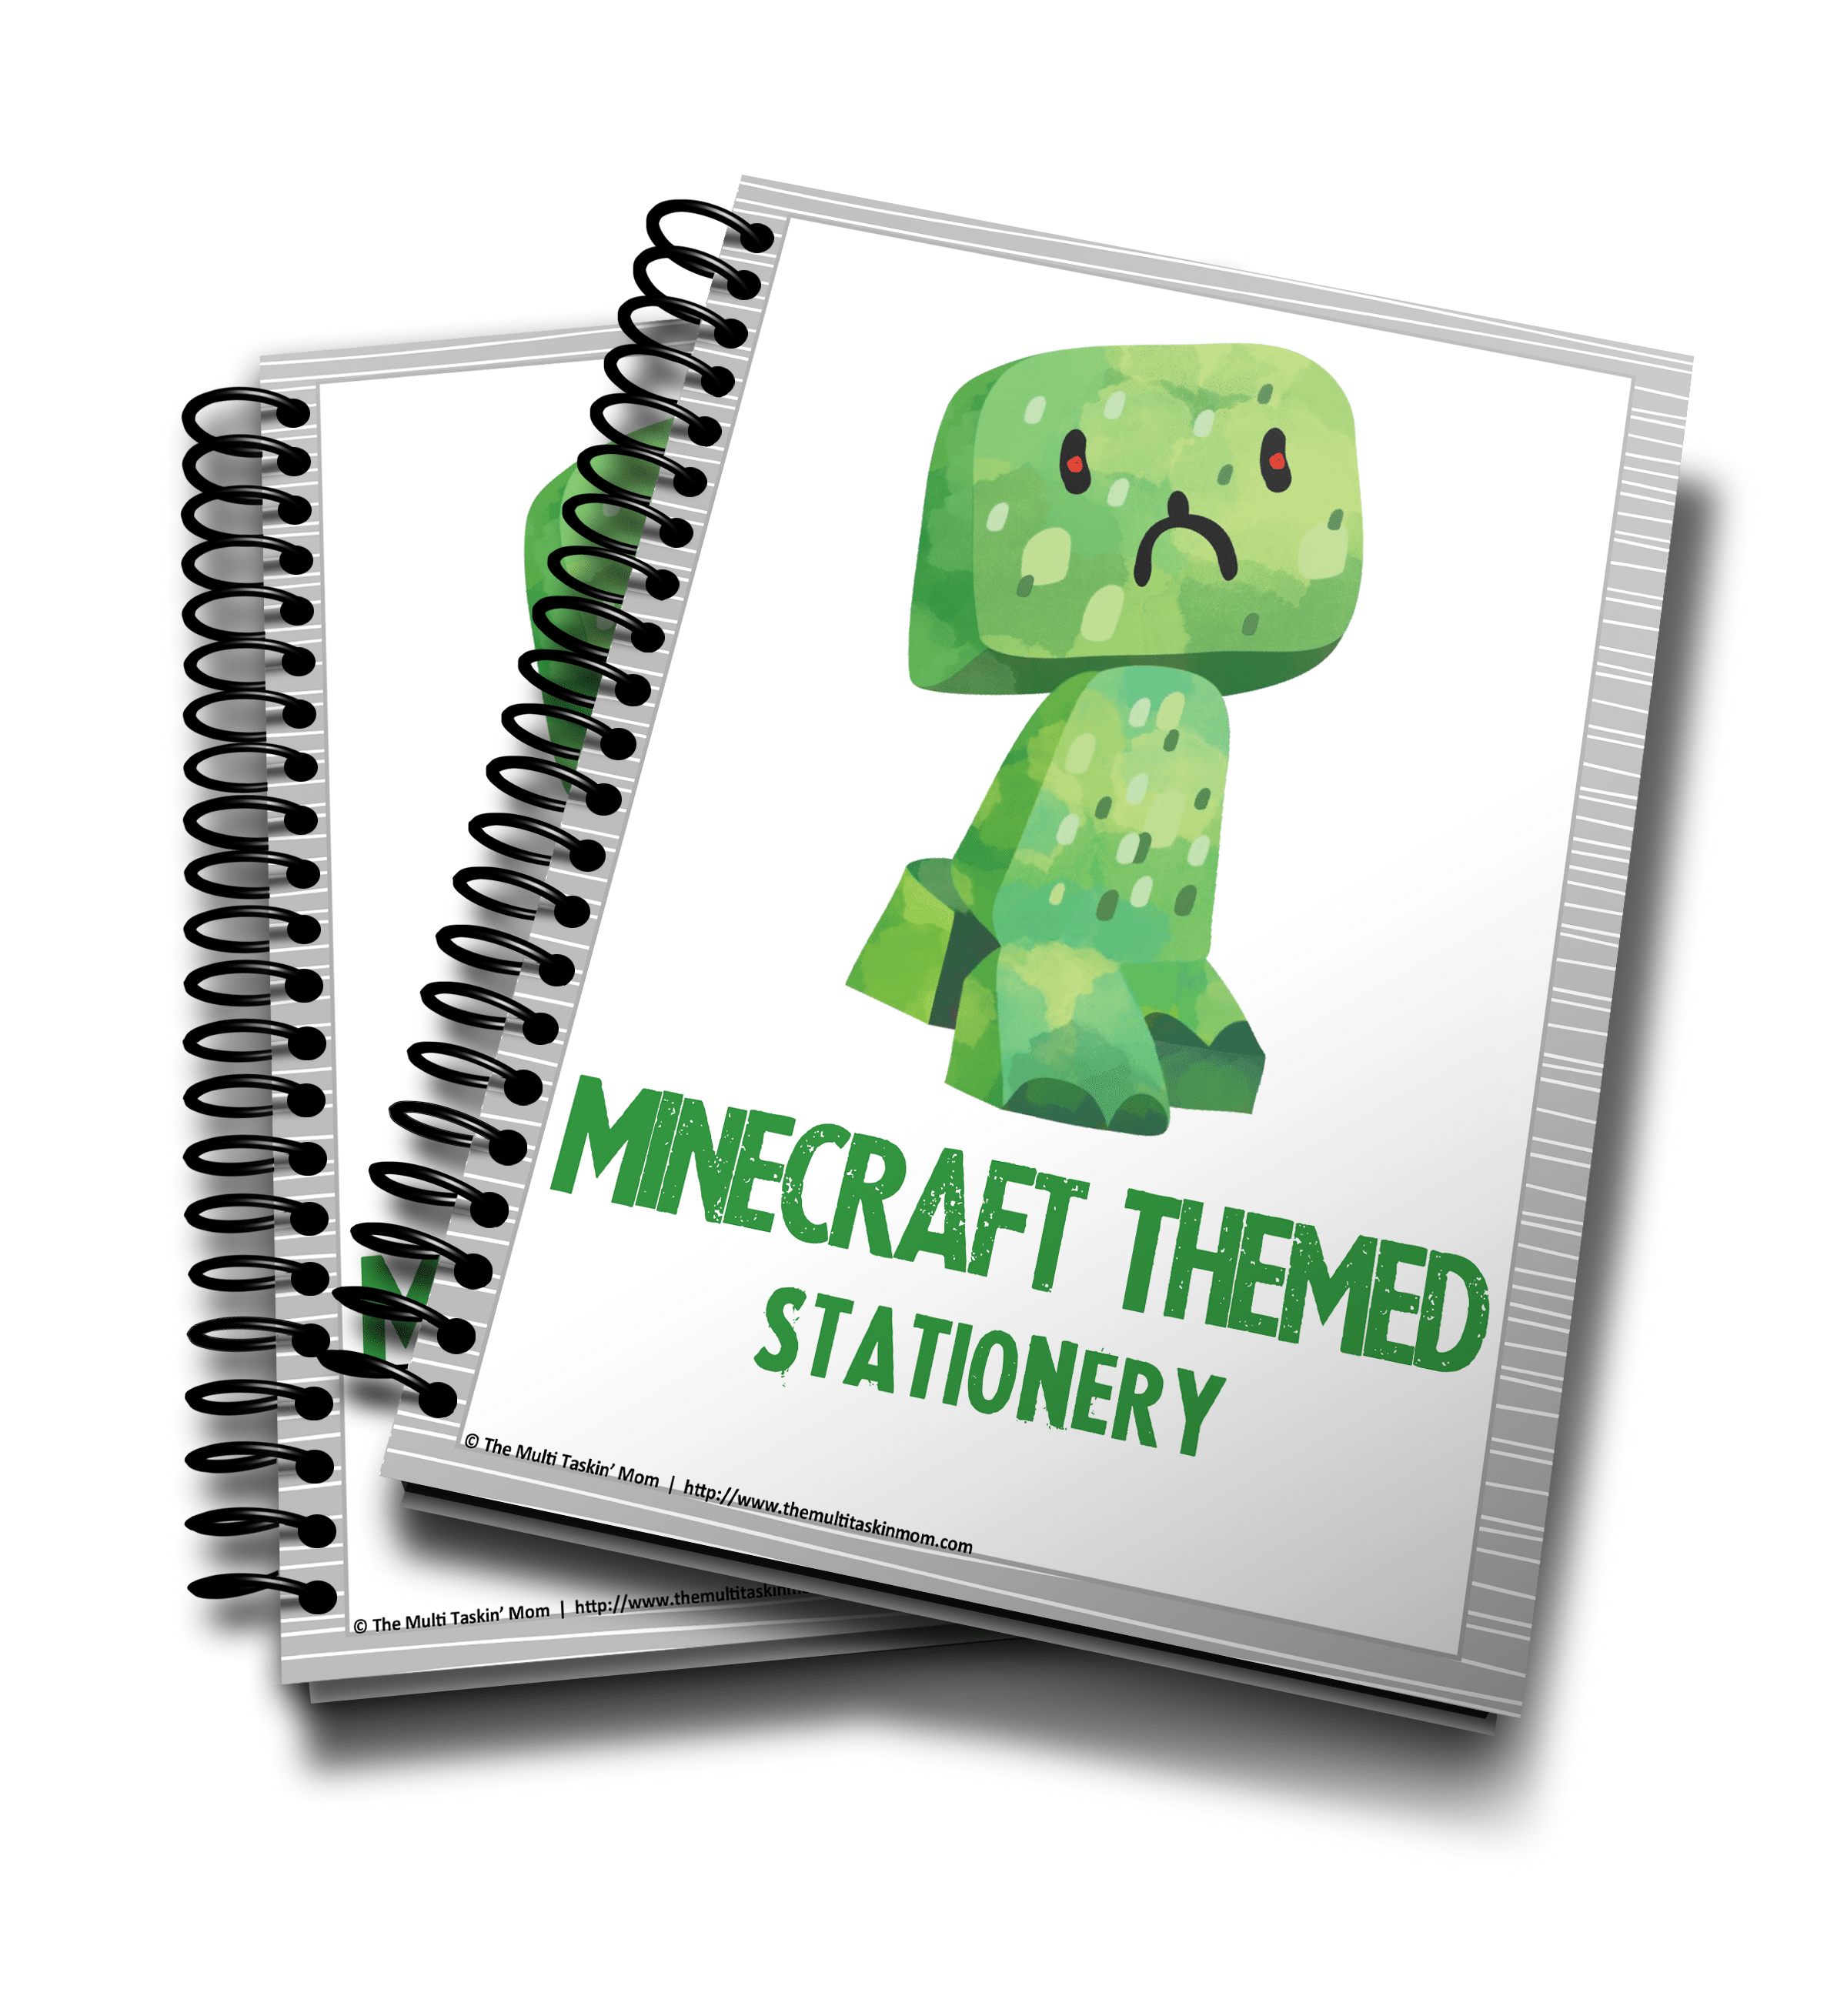 Minecraft Themed Stationery 2016